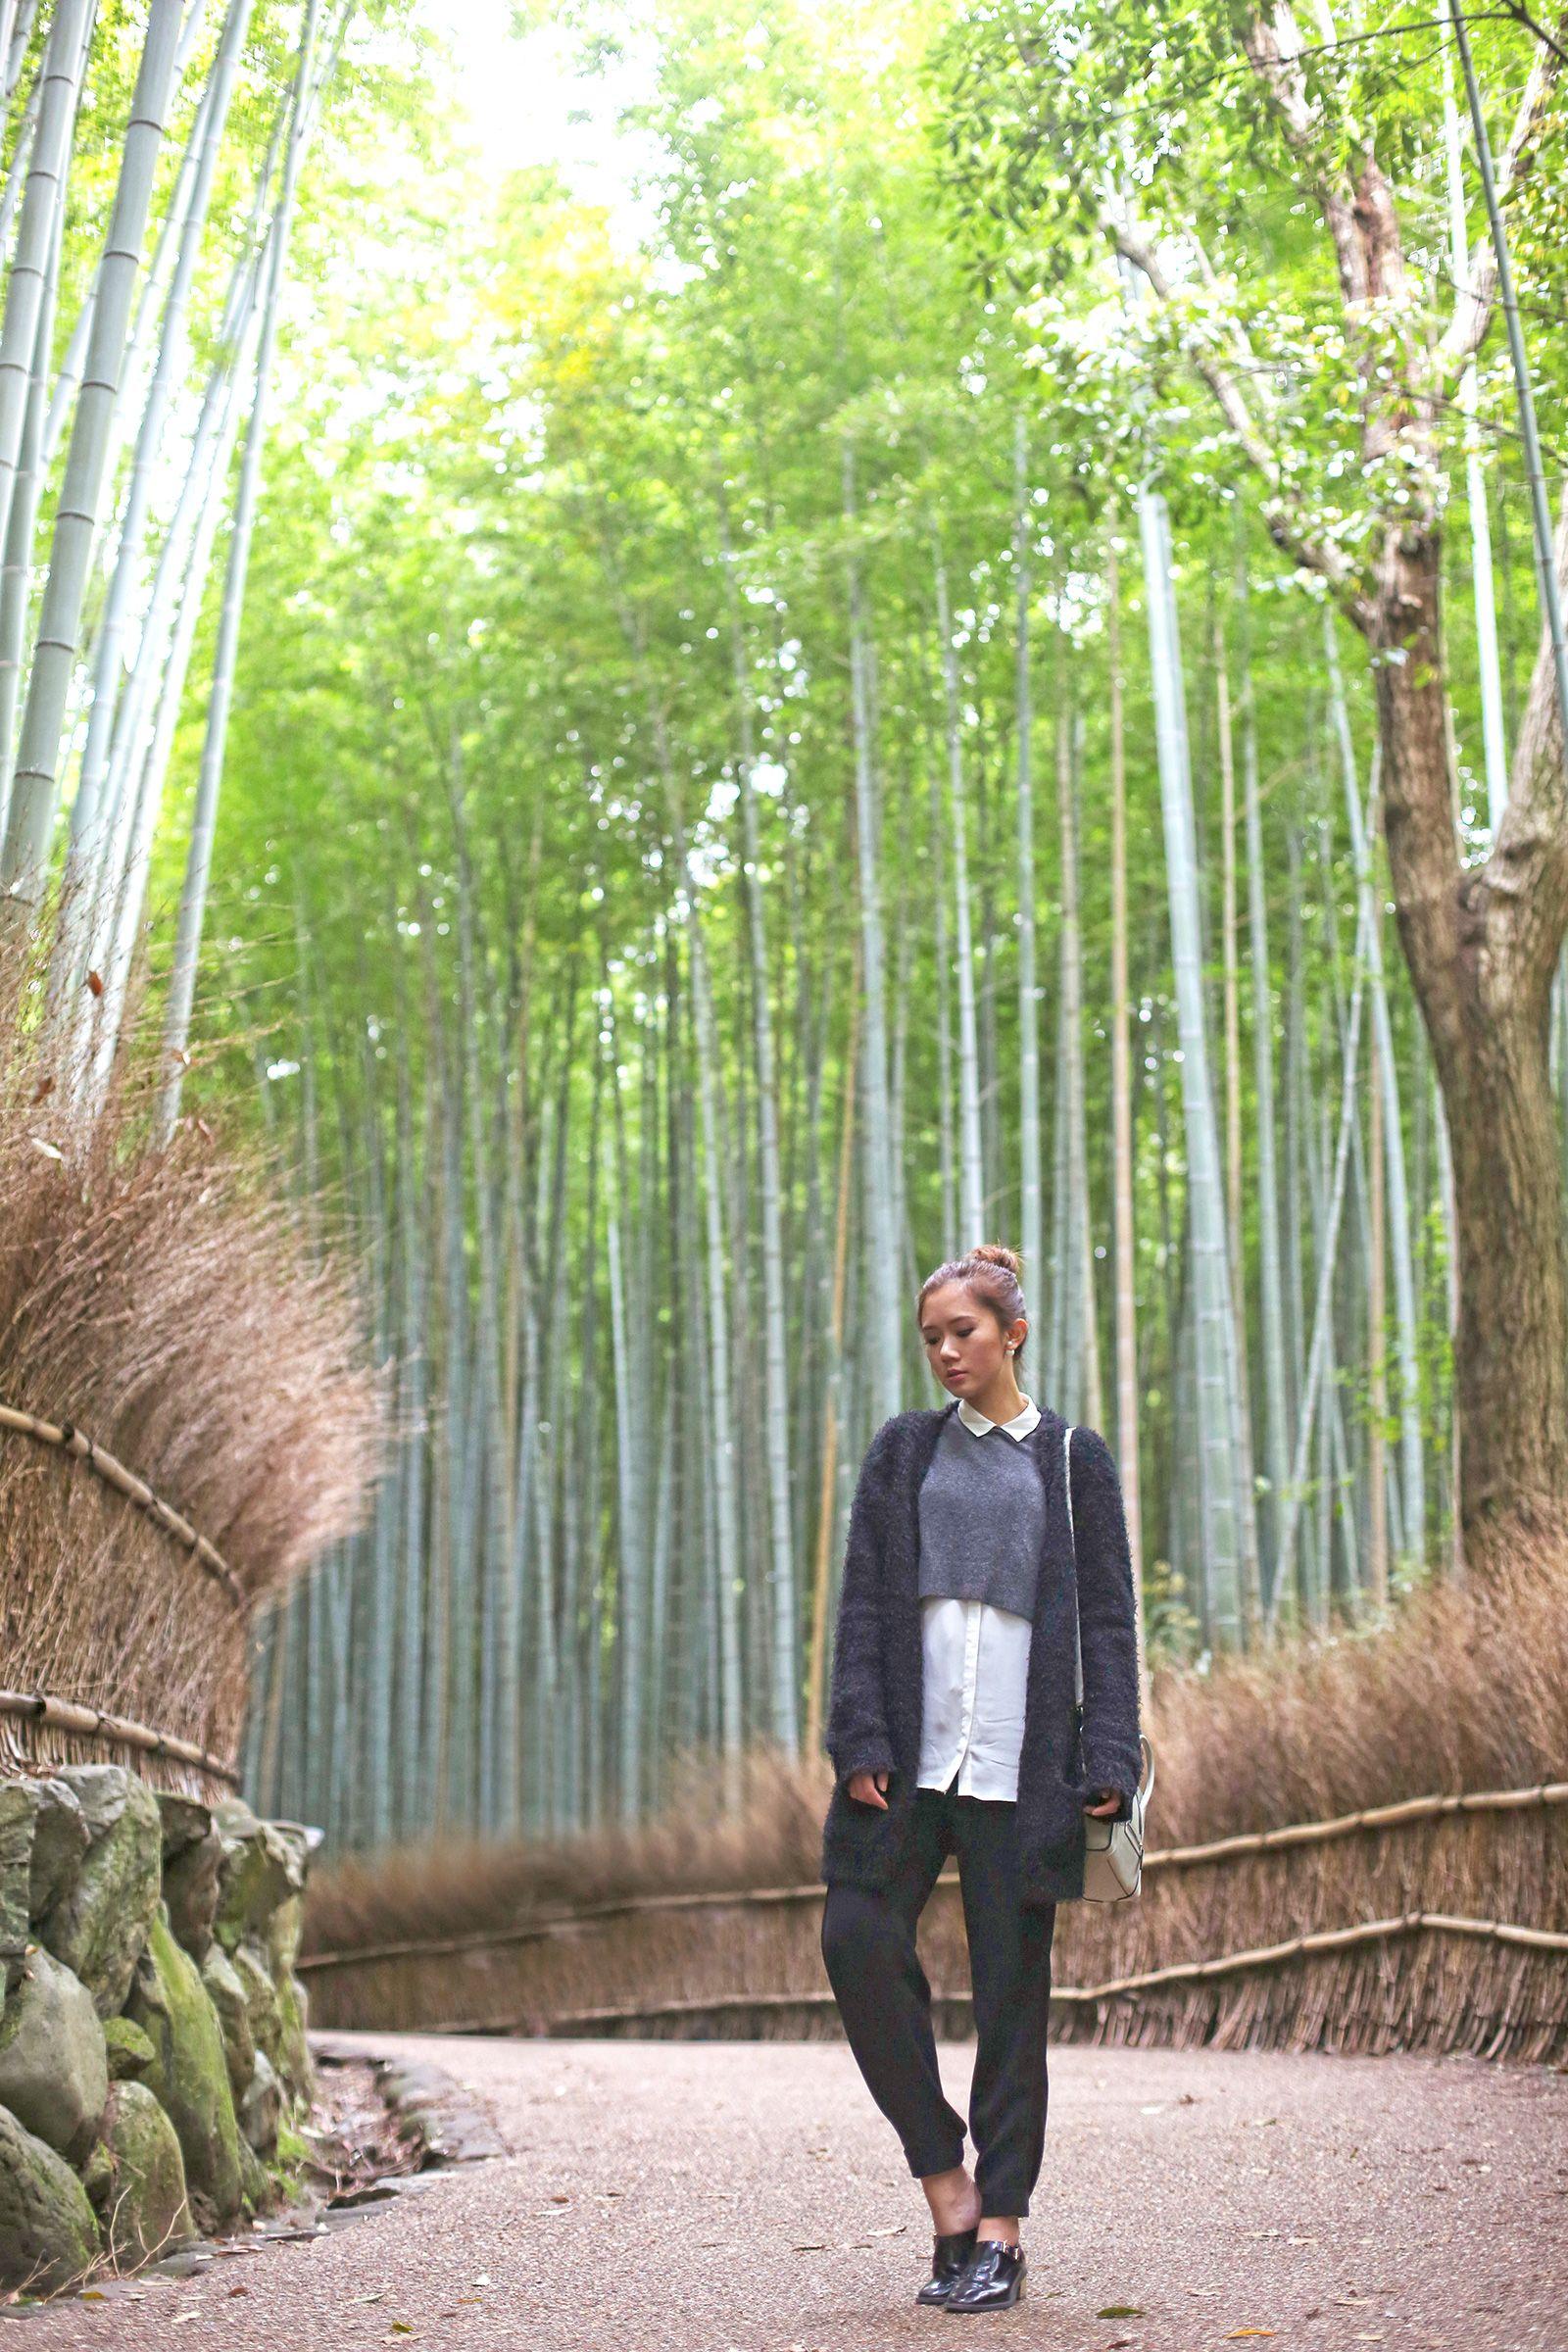 Arashimaya Bamboo Grove - www.itscamilleco.com